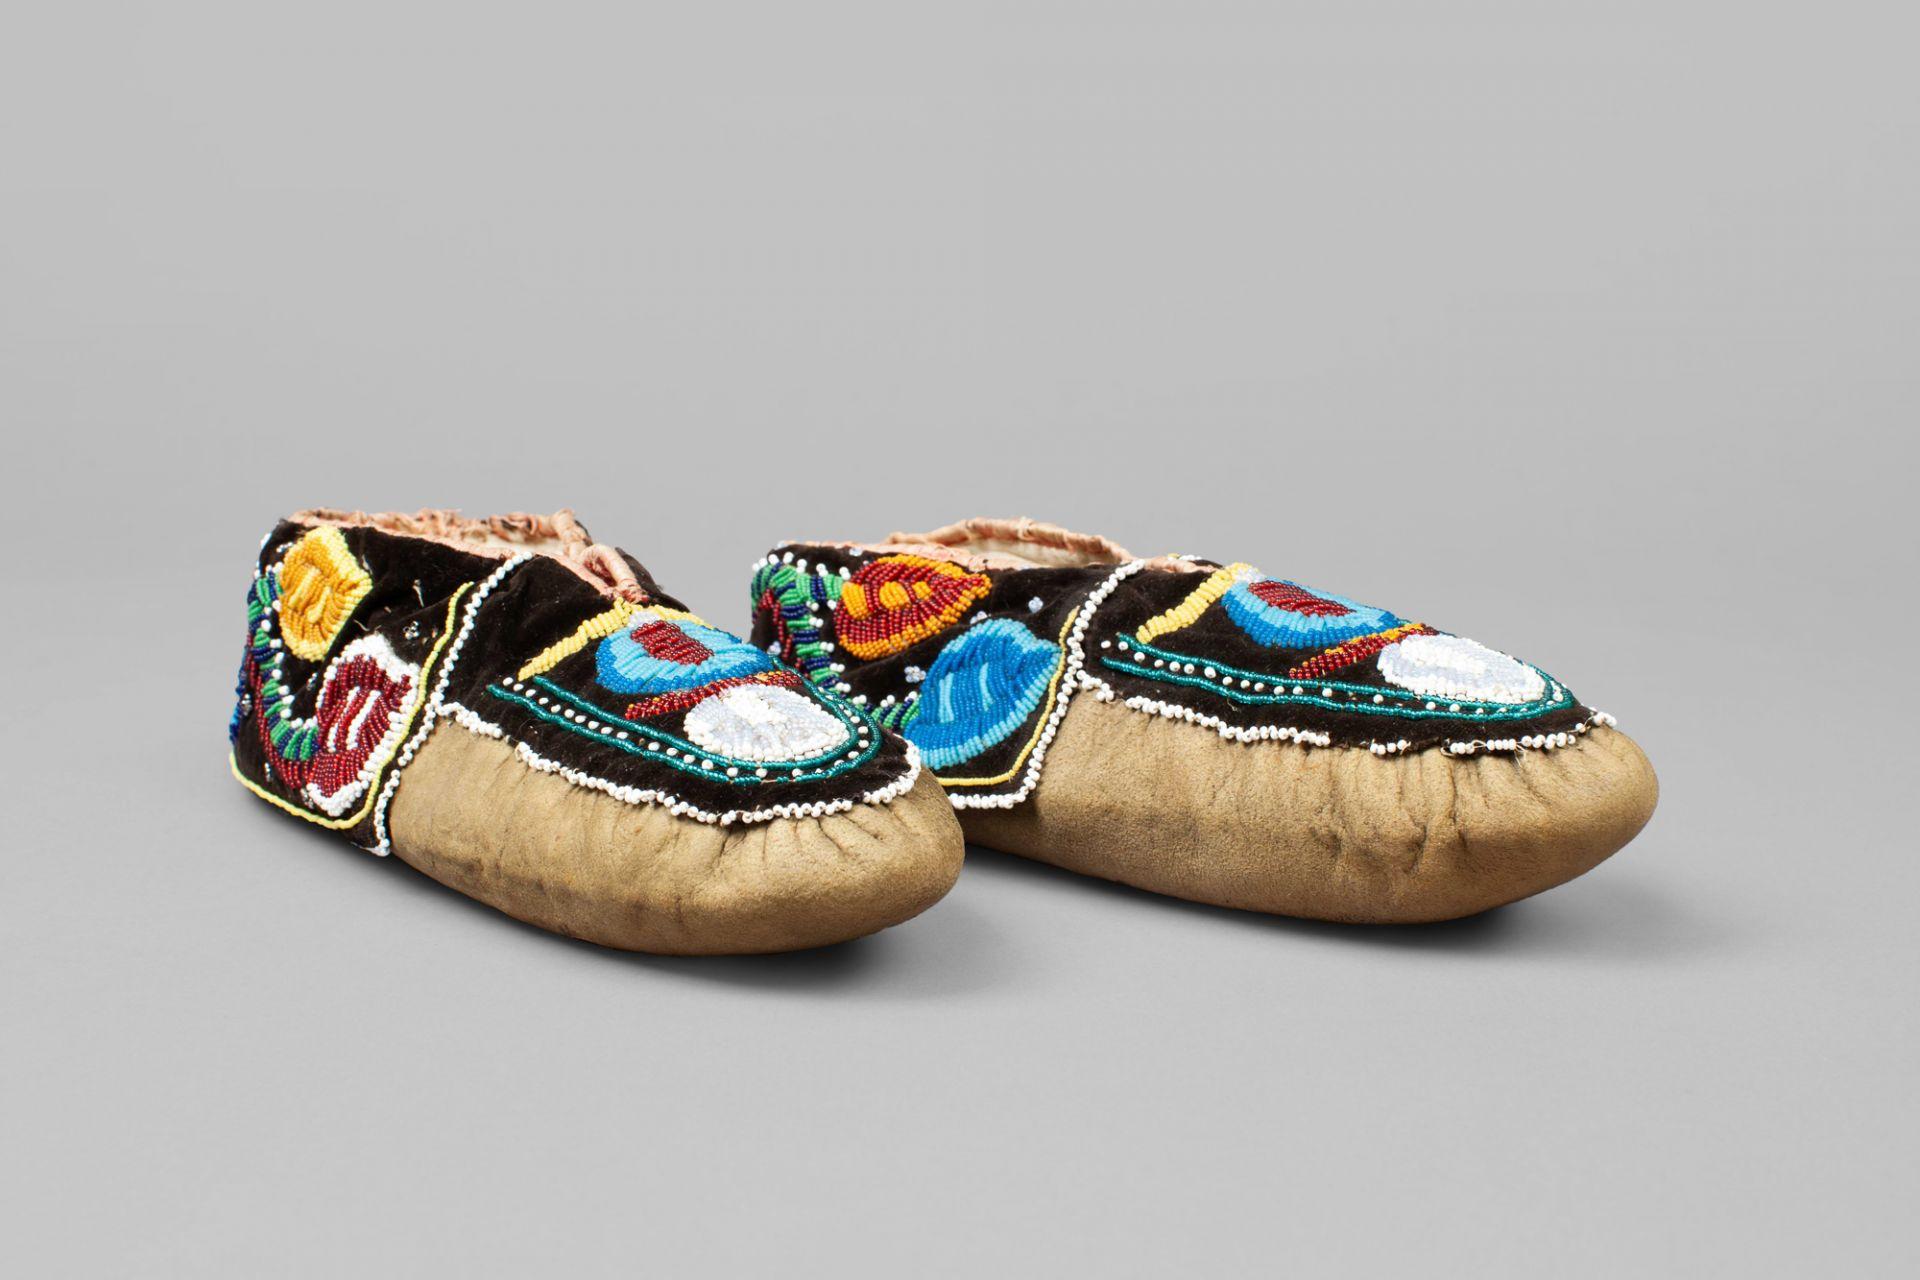 Moccasins, North America, 19th/20th century